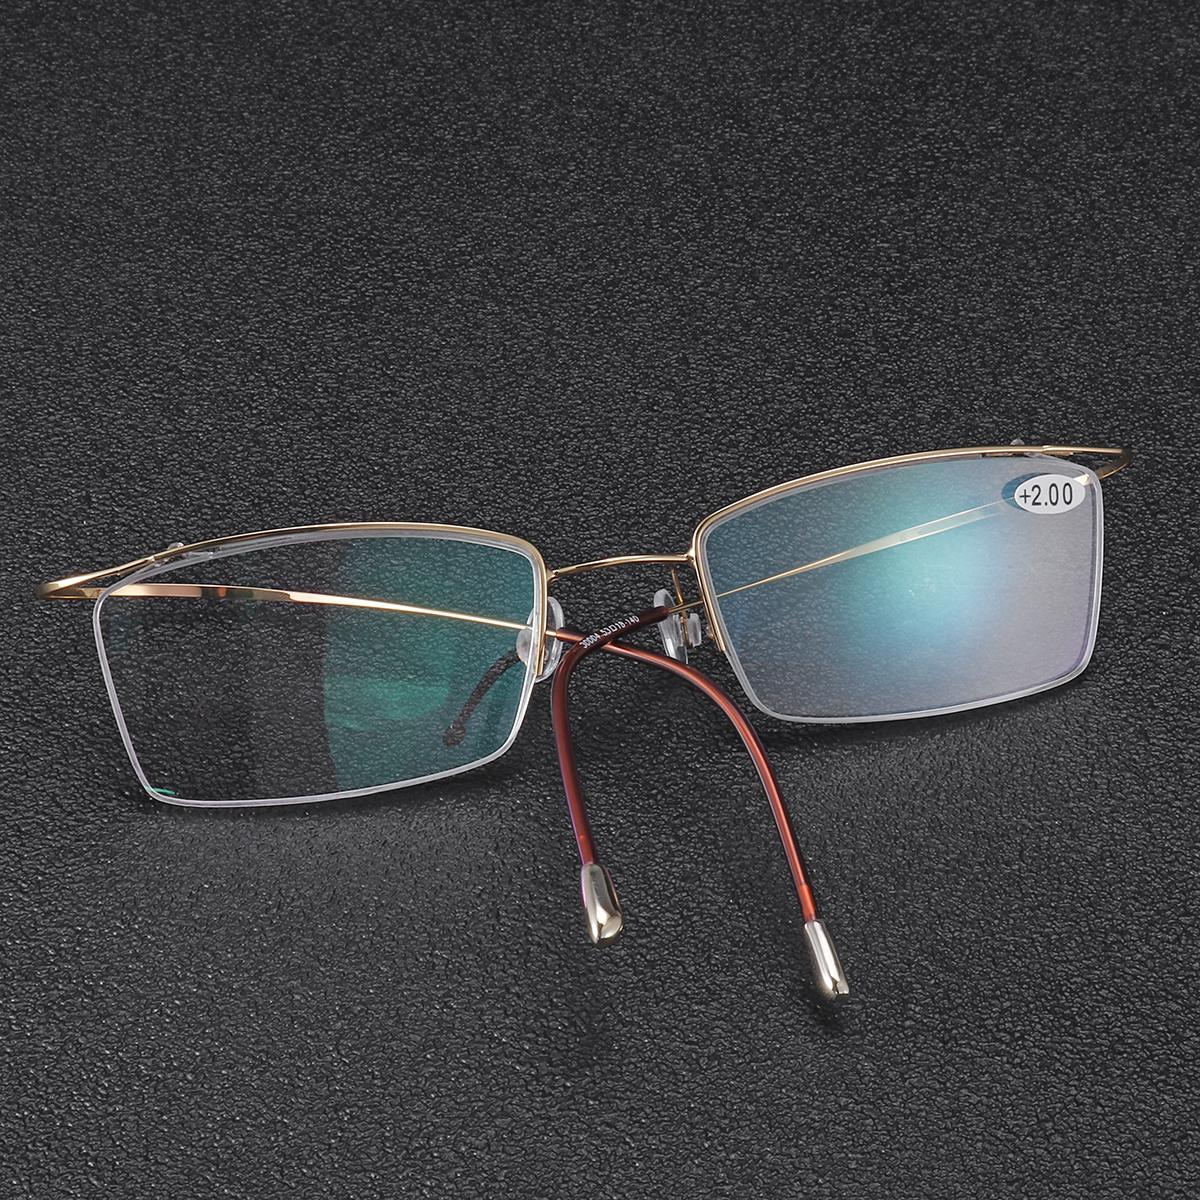 e12894f5de BRAODISON Presbyopic Reading Glasses HD Coated Resin Lens Flexible Titanium  Frame · 67817d2d-cf4d-44fa-b0c5-9841704150a7.